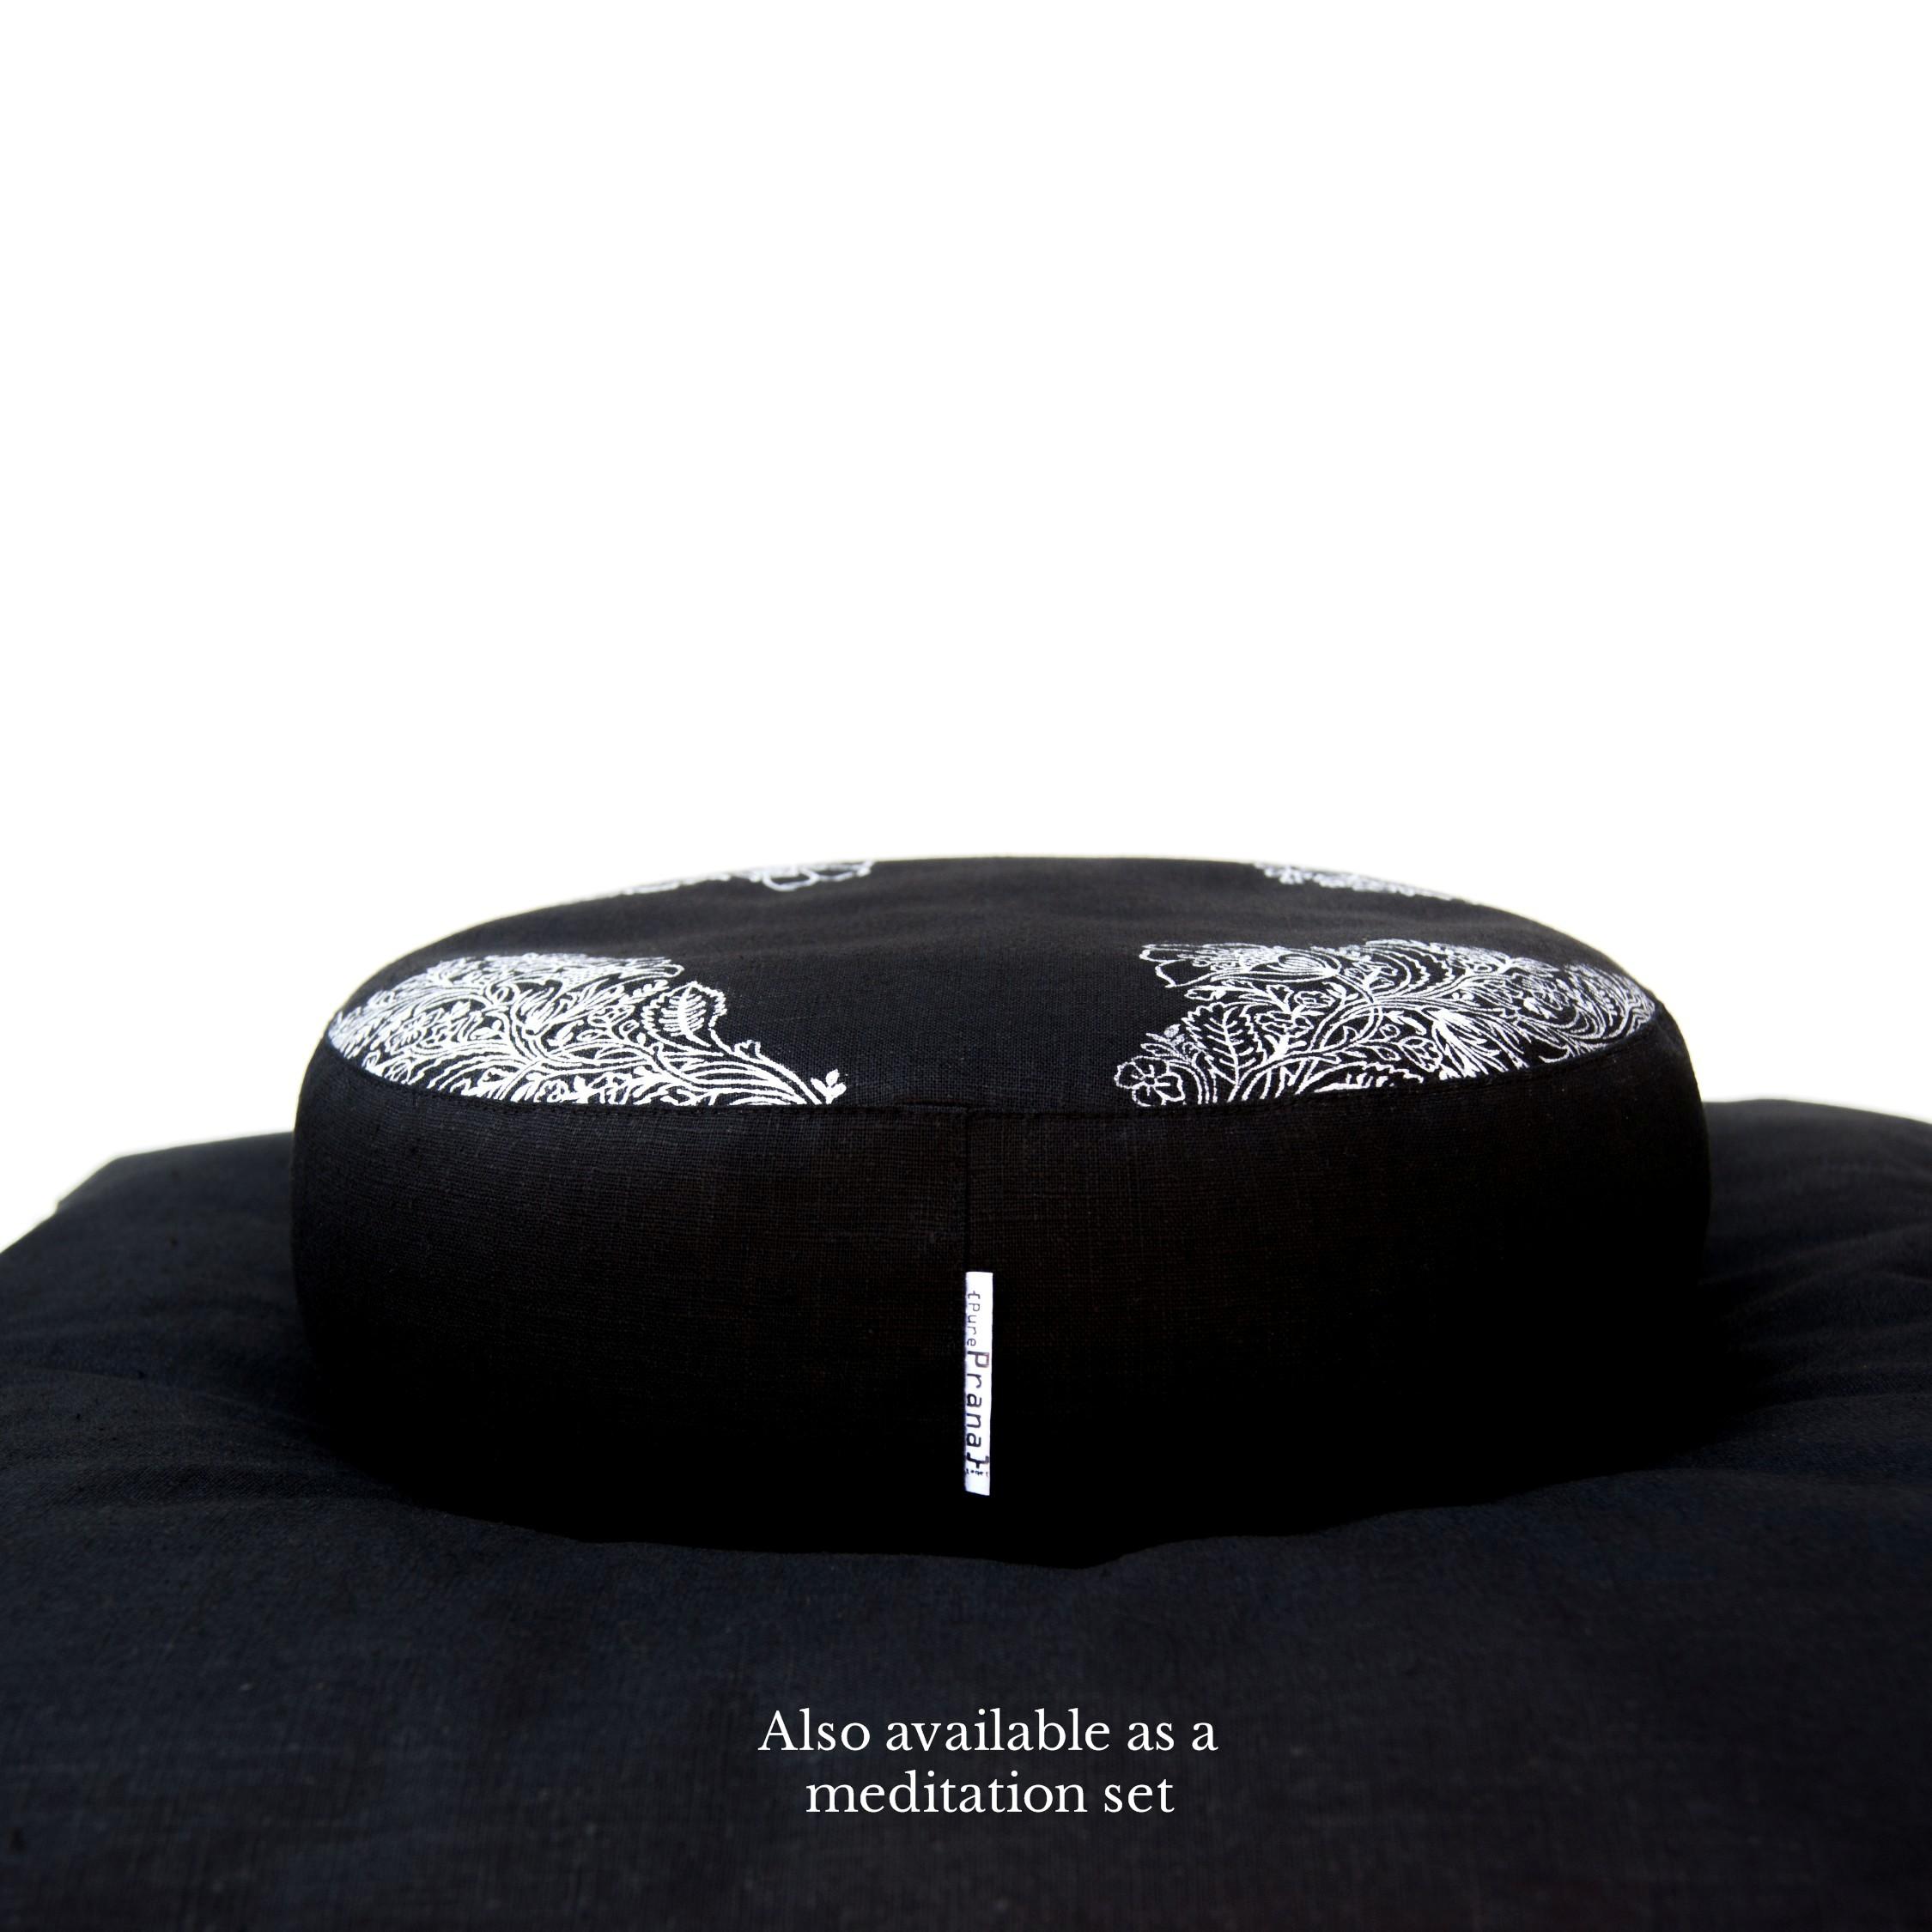 Black linen yoga zafu